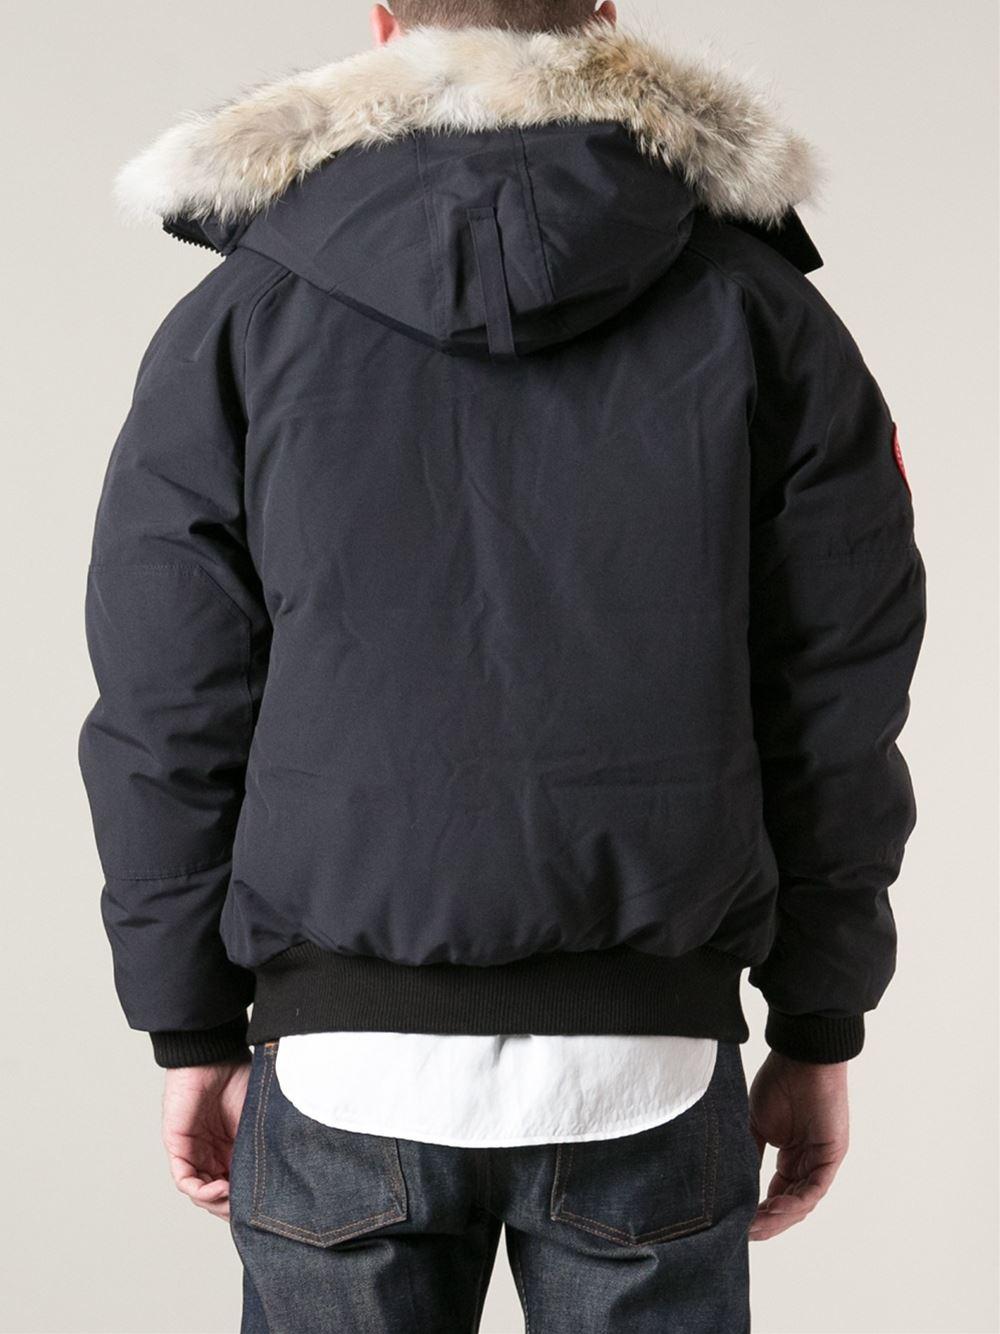 canada goose men's pbi chilliwack bomber jacket